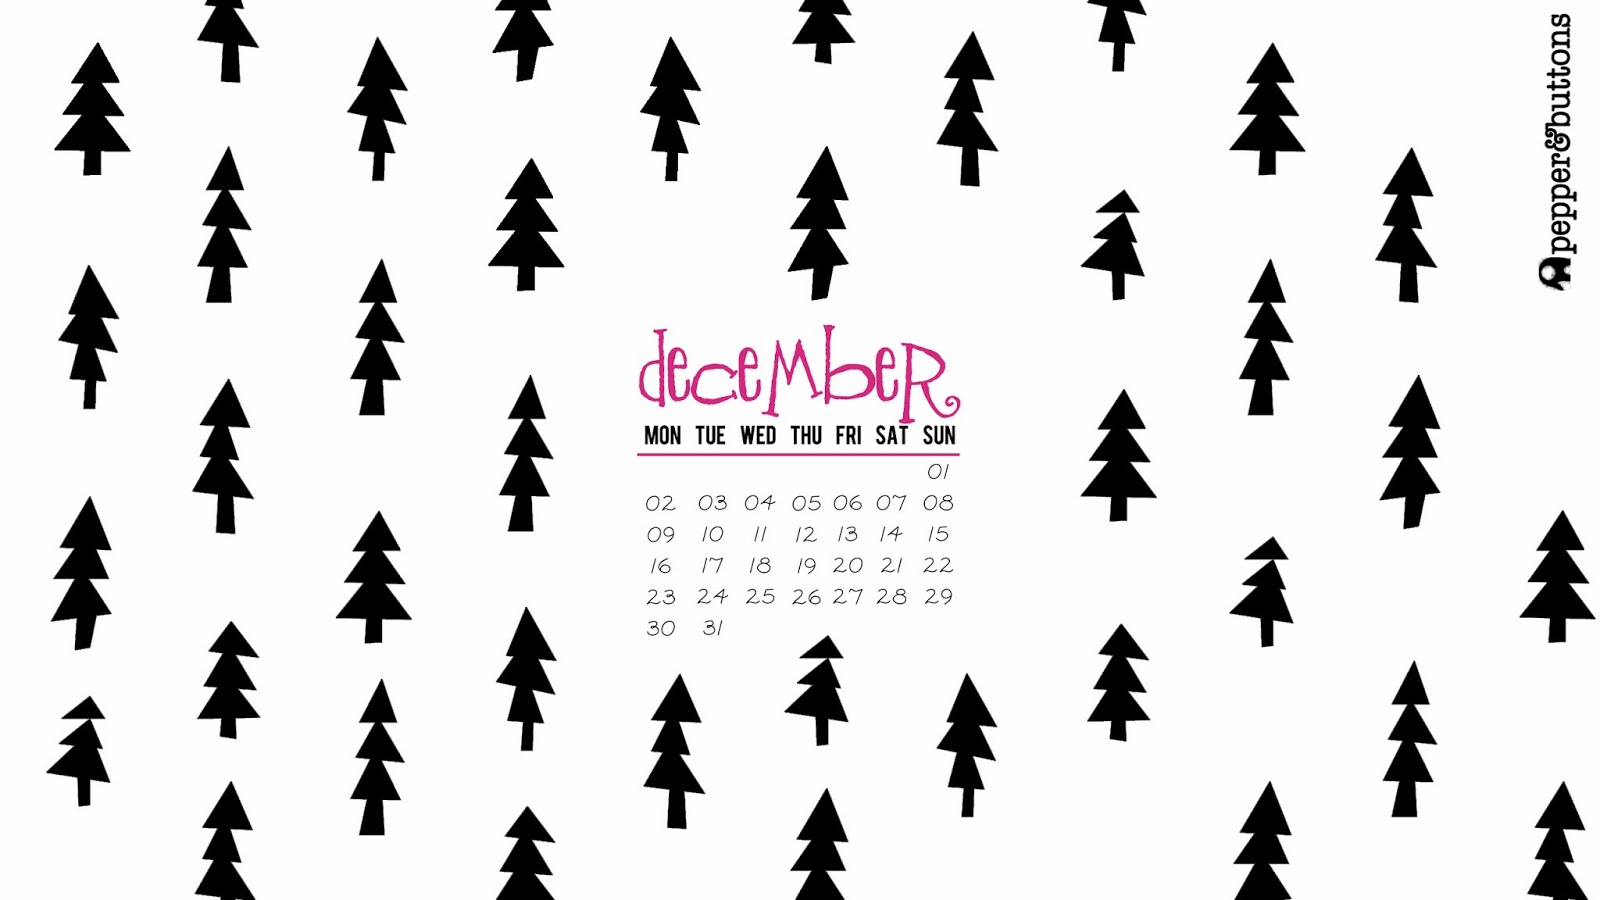 Free Desktop Wallpaper Dezember 2013